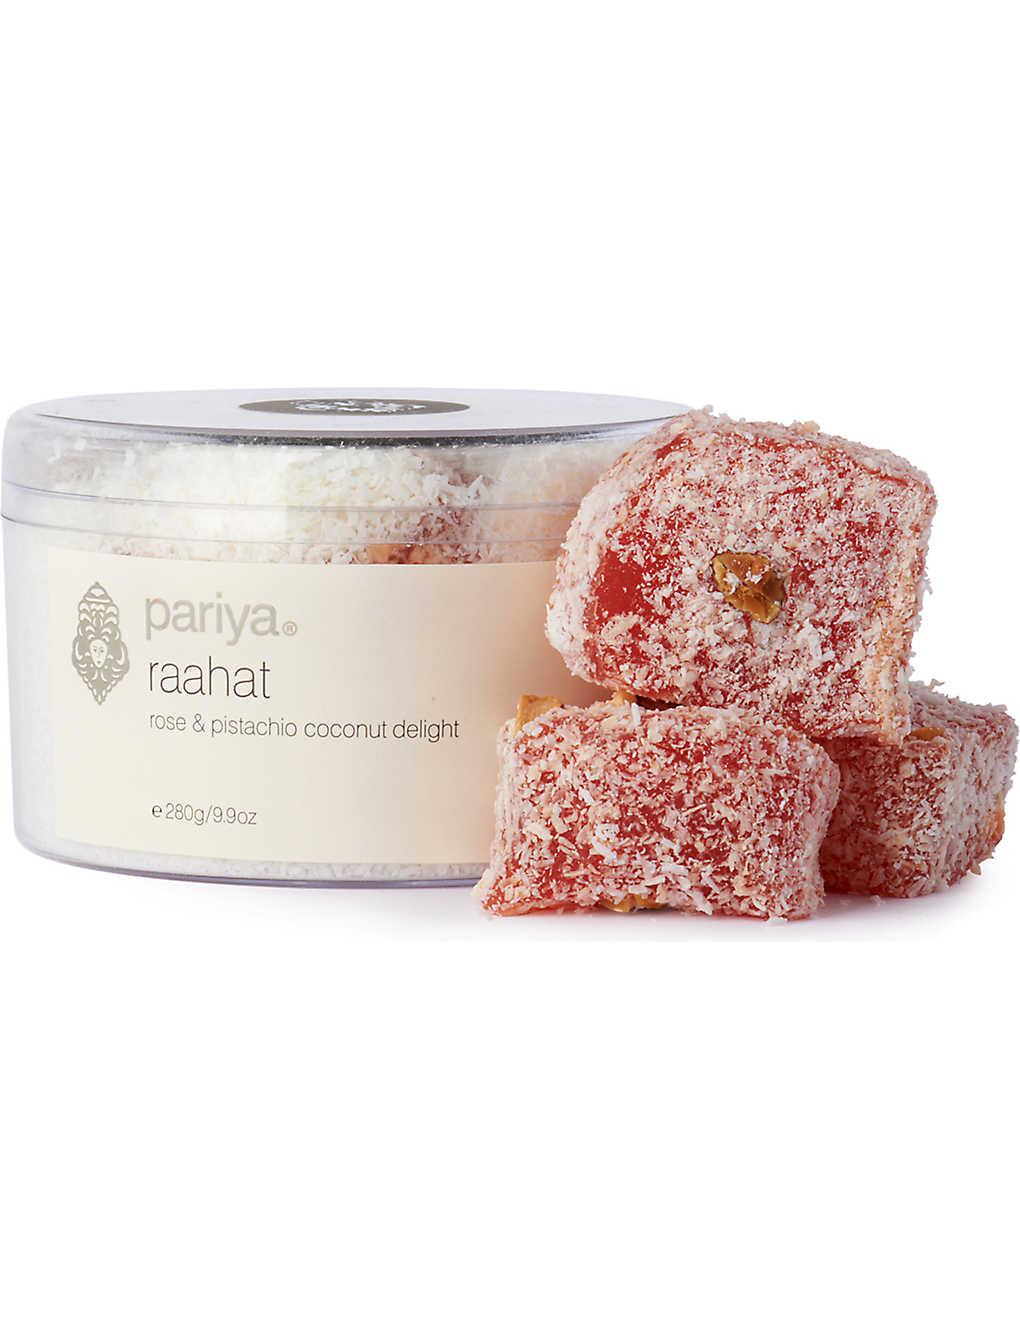 PARIYA - Raahat rose and pistachio coconut 280g | Selfridges com